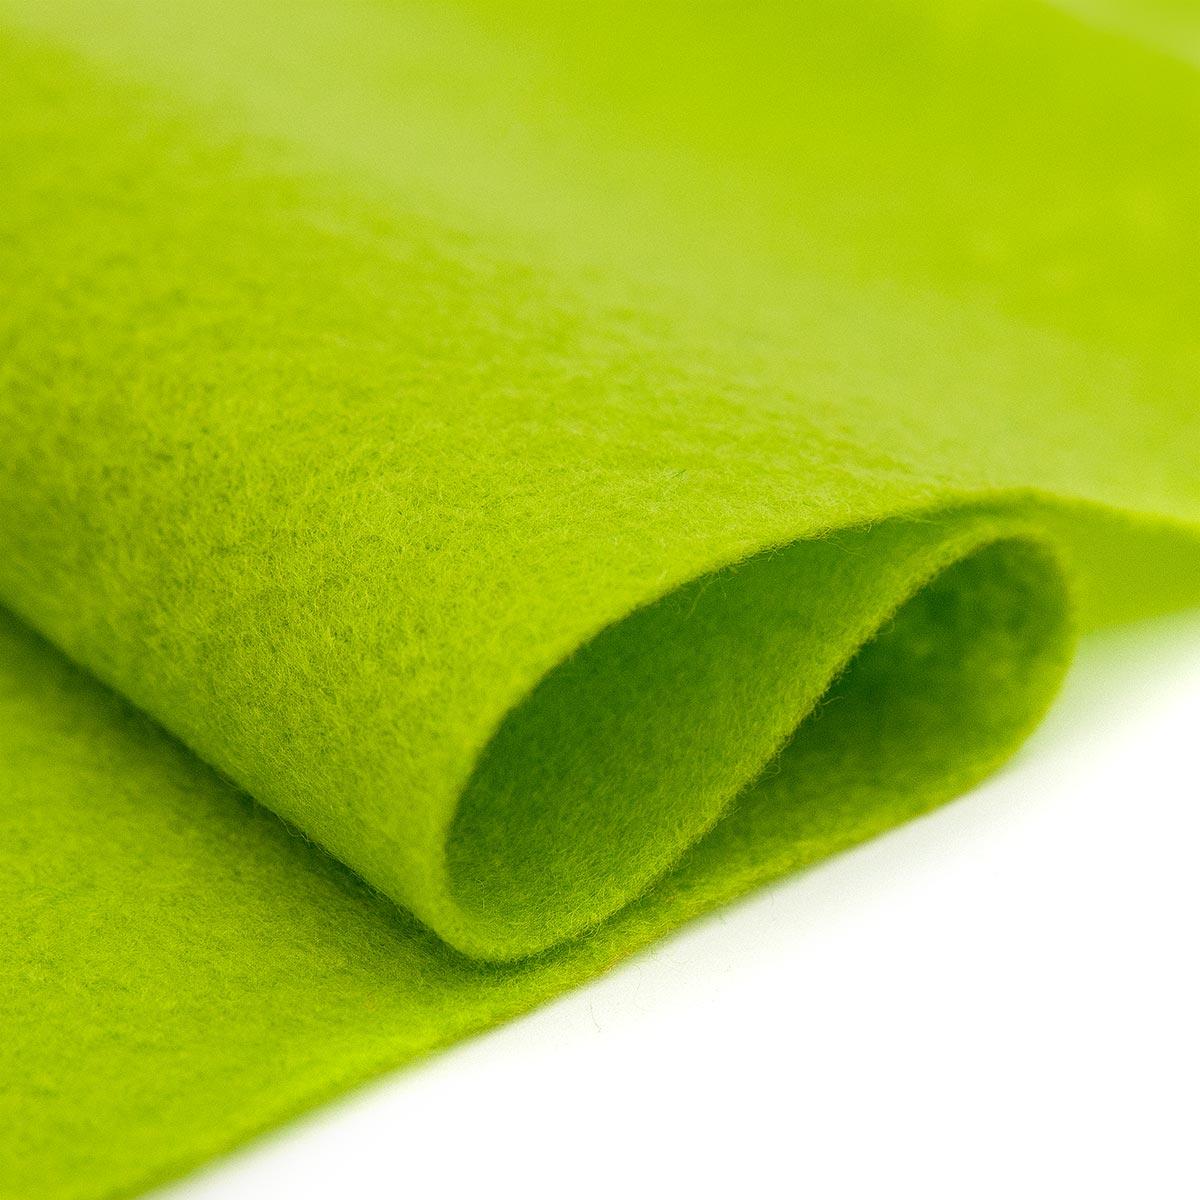 61212630 Фетр для творчества, светло-зеленый, 2мм, 20x30см, уп./1шт. Glorex